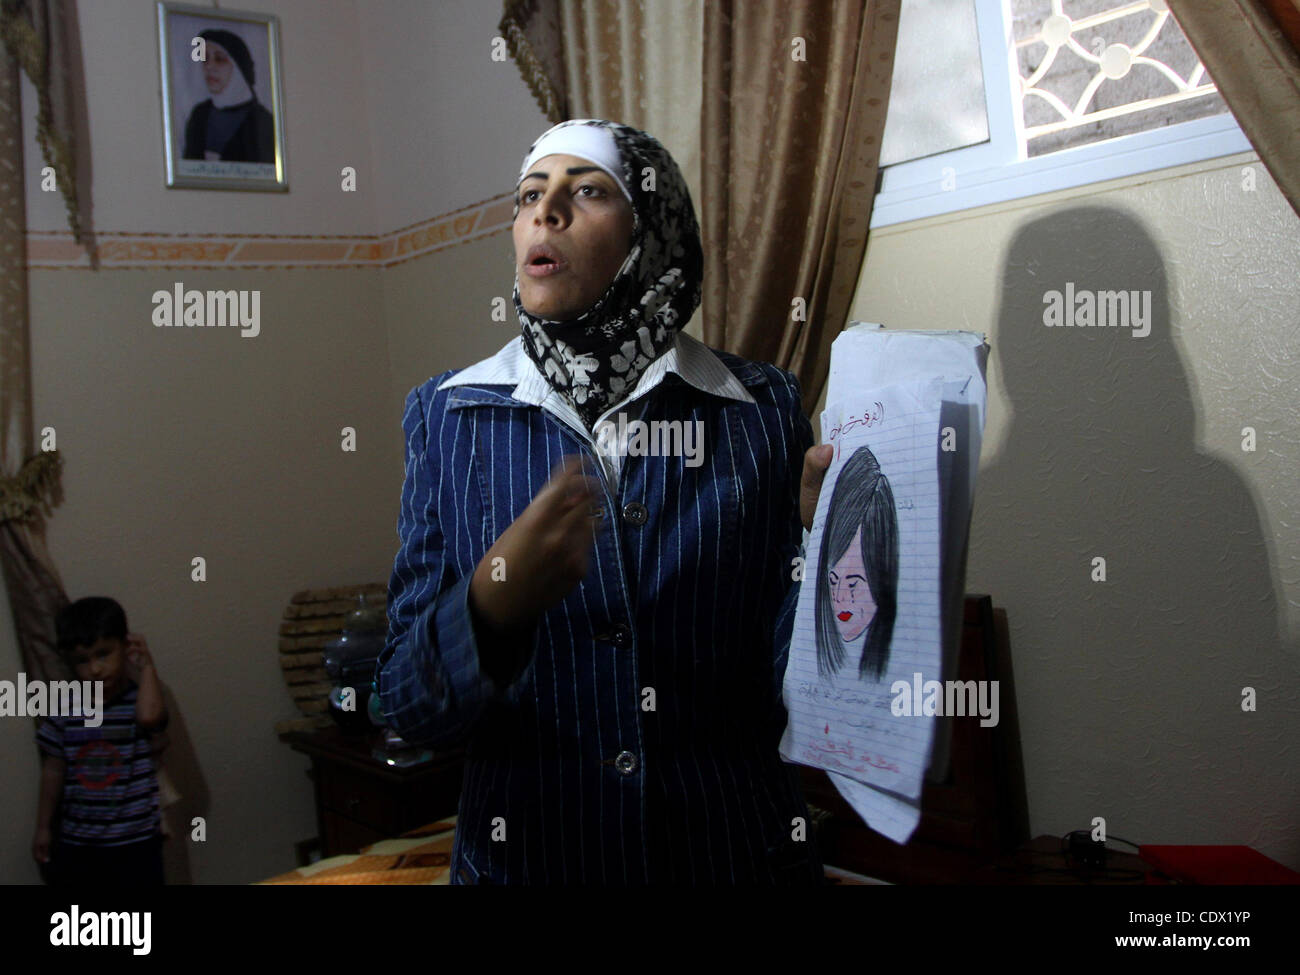 Oct. 19, 2011 - Gaza City, Gaza Strip, Palestinian Territory - Freed Palestinian prisoner Wafa Albes displays her Stock Photo